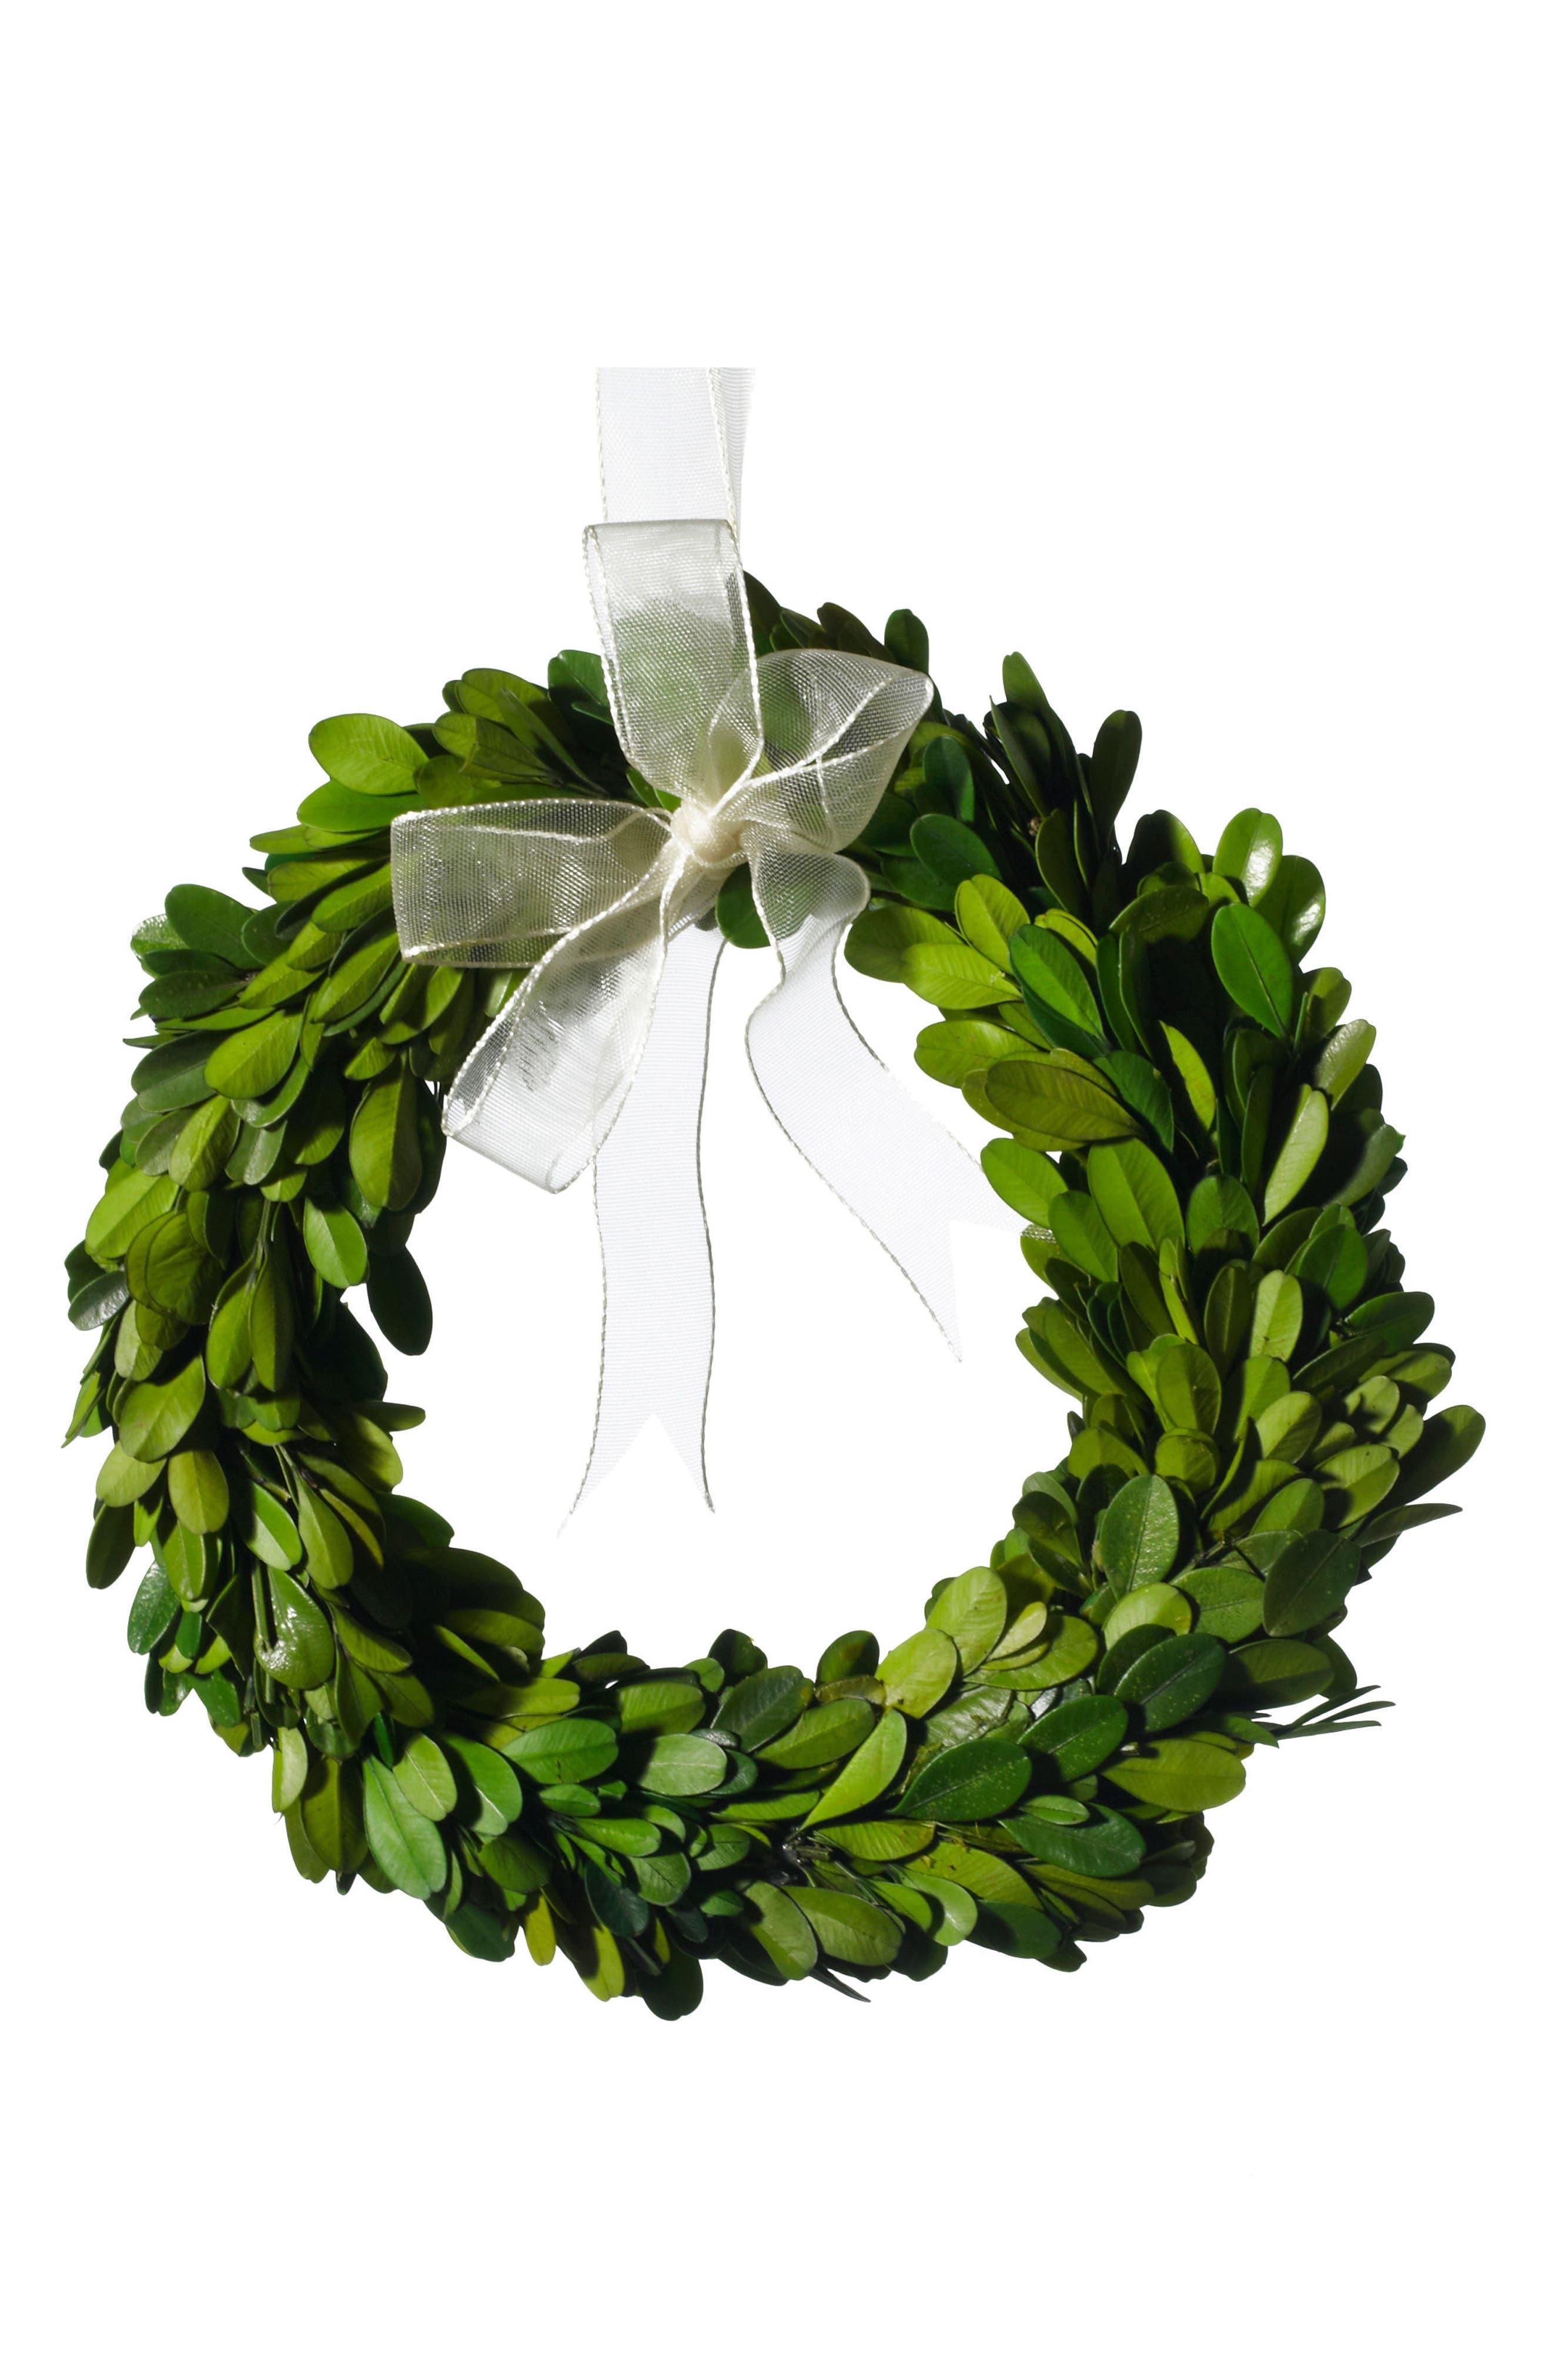 Main Image - Accent Decor Mini Boxwood Wreath